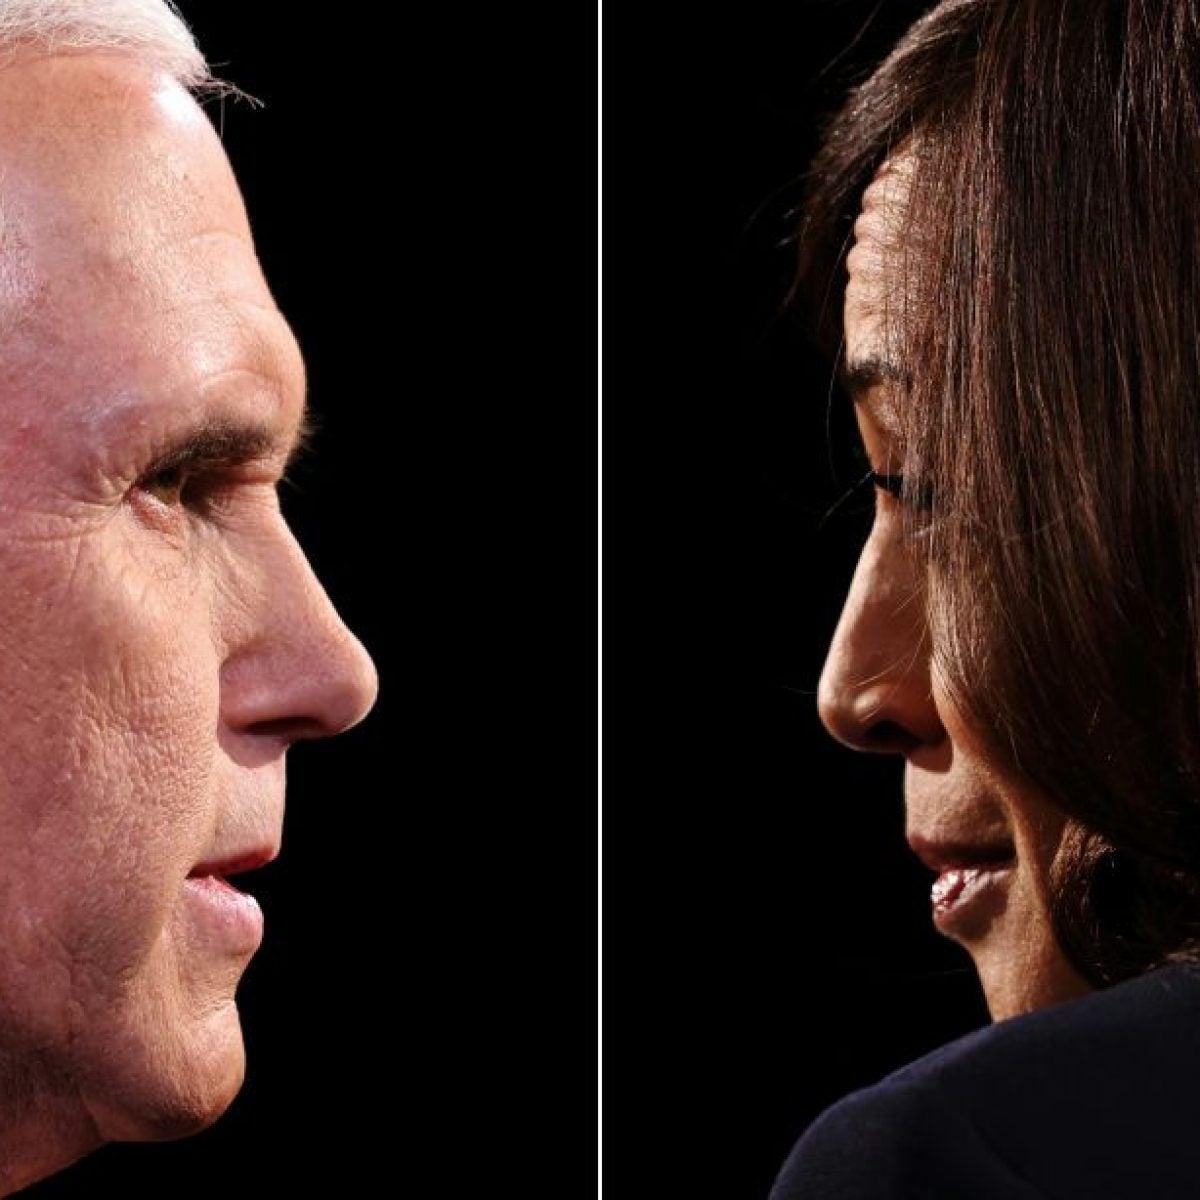 The Big VP Debate Takeaway: Black Women, Take Back Your Power